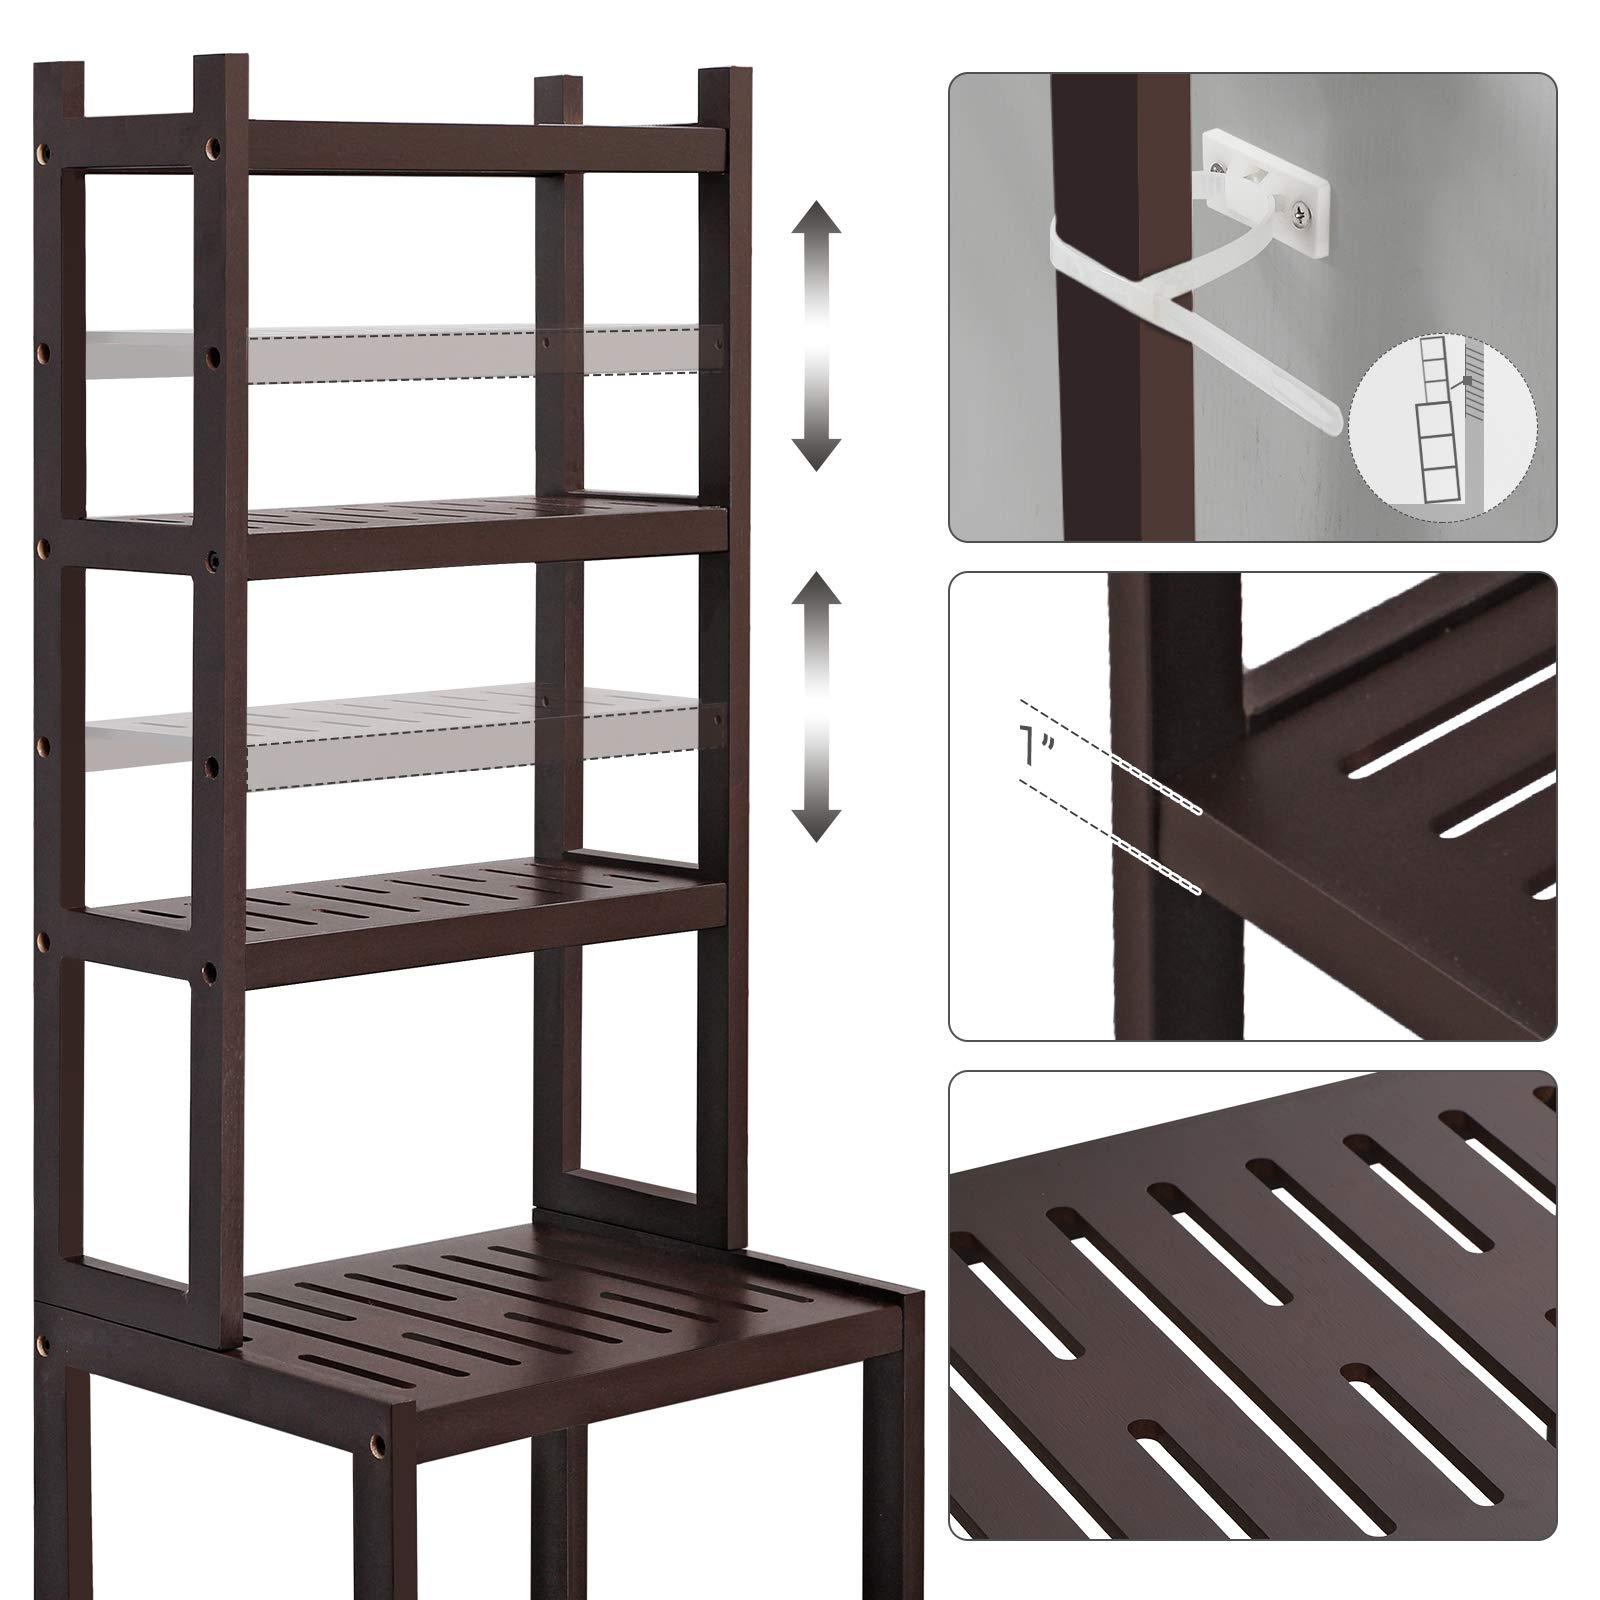 SONGMICS 7-Tier Bamboo Bathroom Shelf, 2-in-1 Design Adjustable Storage Rack, Free Standing Multifunctional Organizer, Shelving Unit for Washroom, Living Room, Kitchen, Brown UBCR01BR by SONGMICS (Image #7)